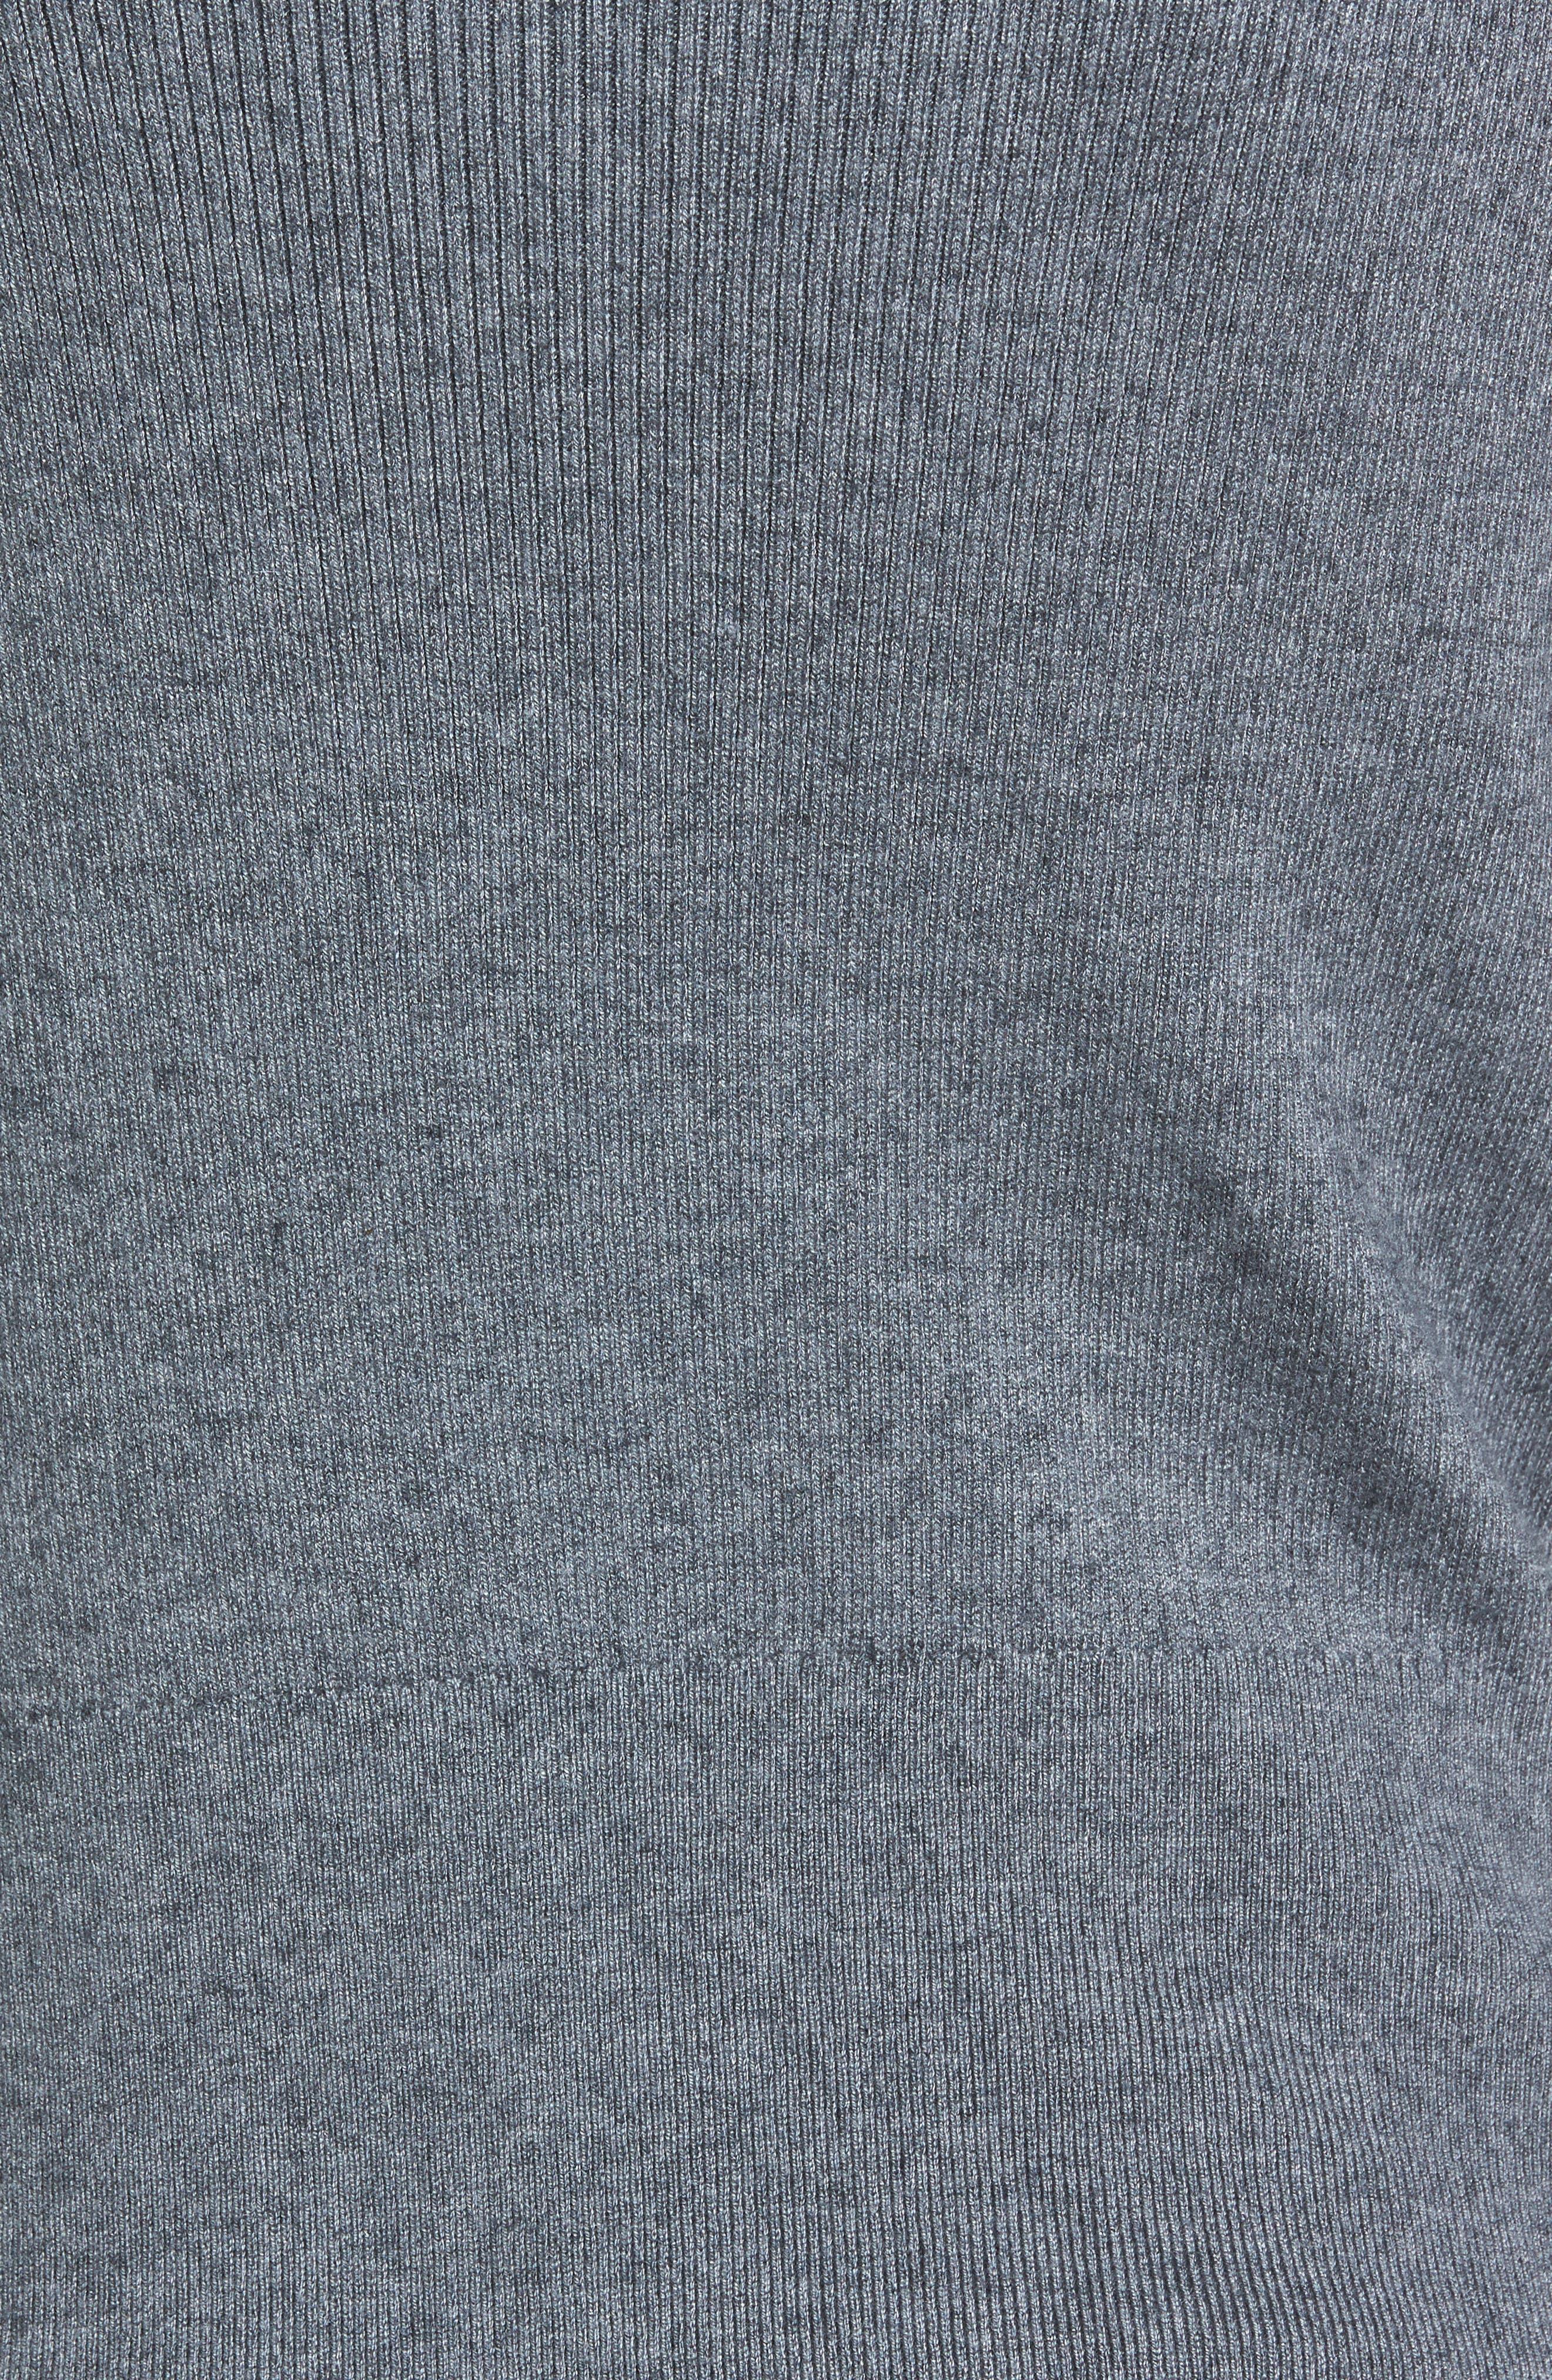 Wide Collar Zip Sweater,                             Alternate thumbnail 5, color,                             Grey Dark Heather